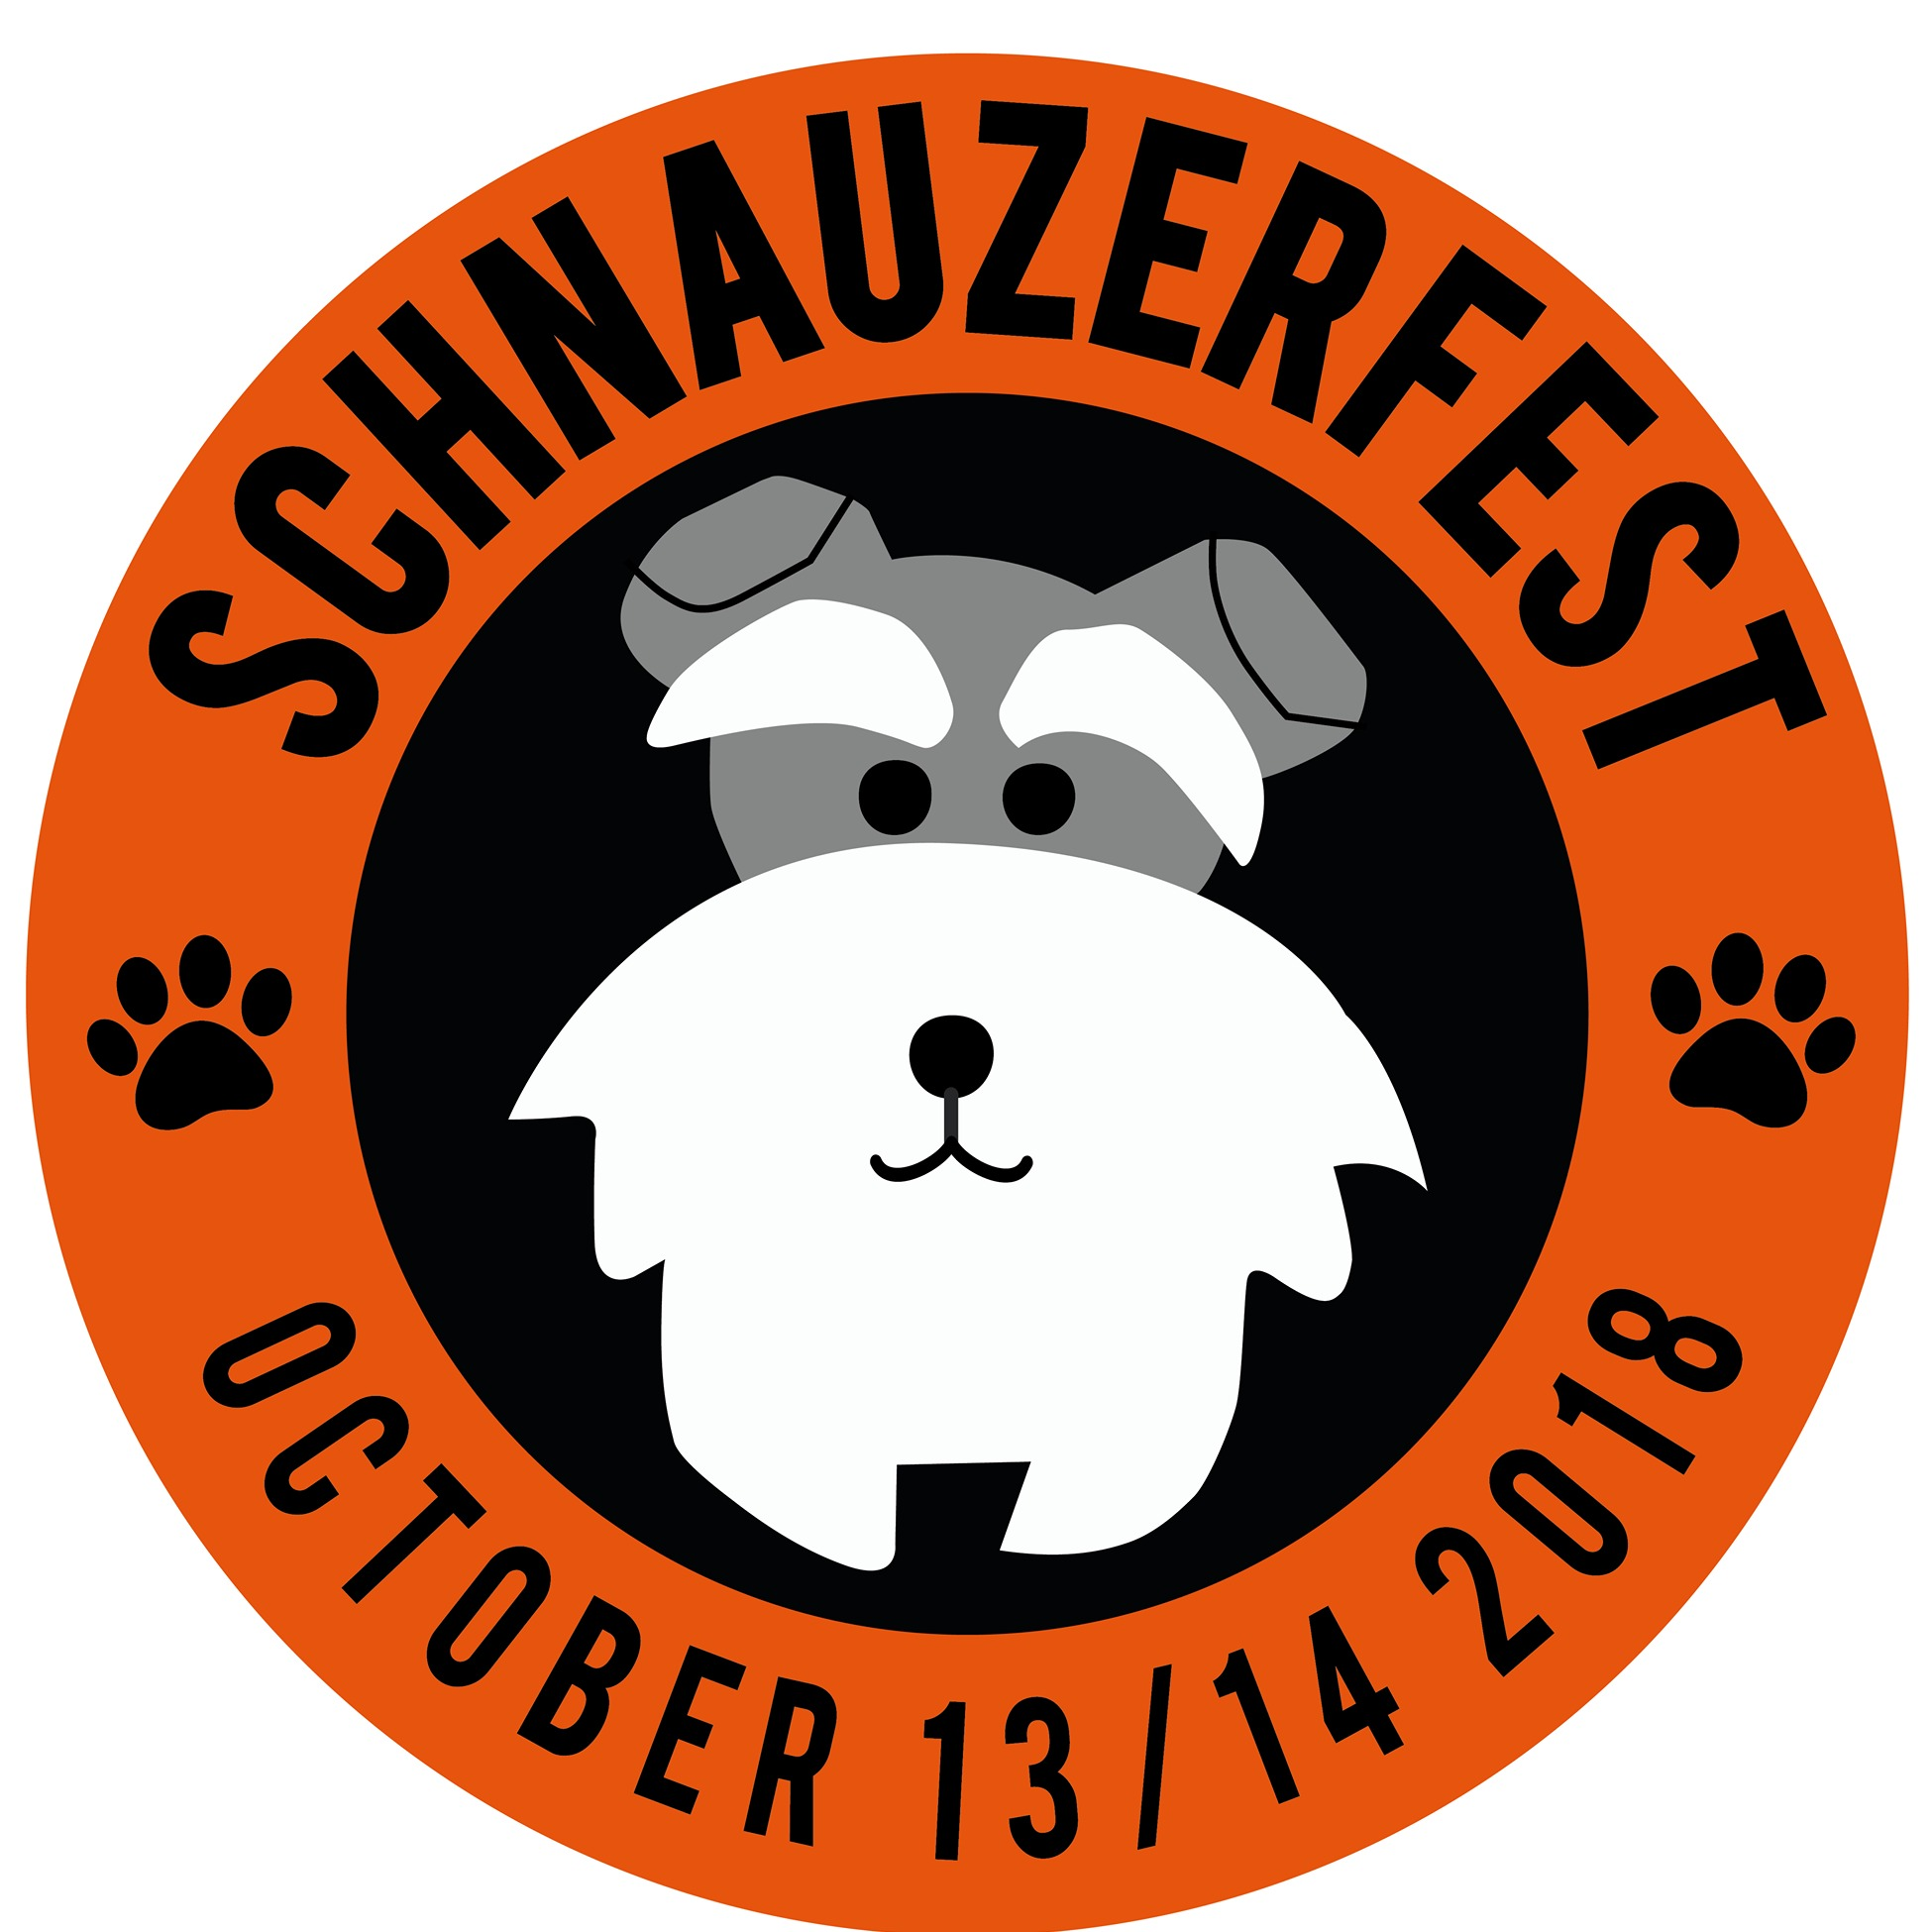 logo Schnauzertfest 2018